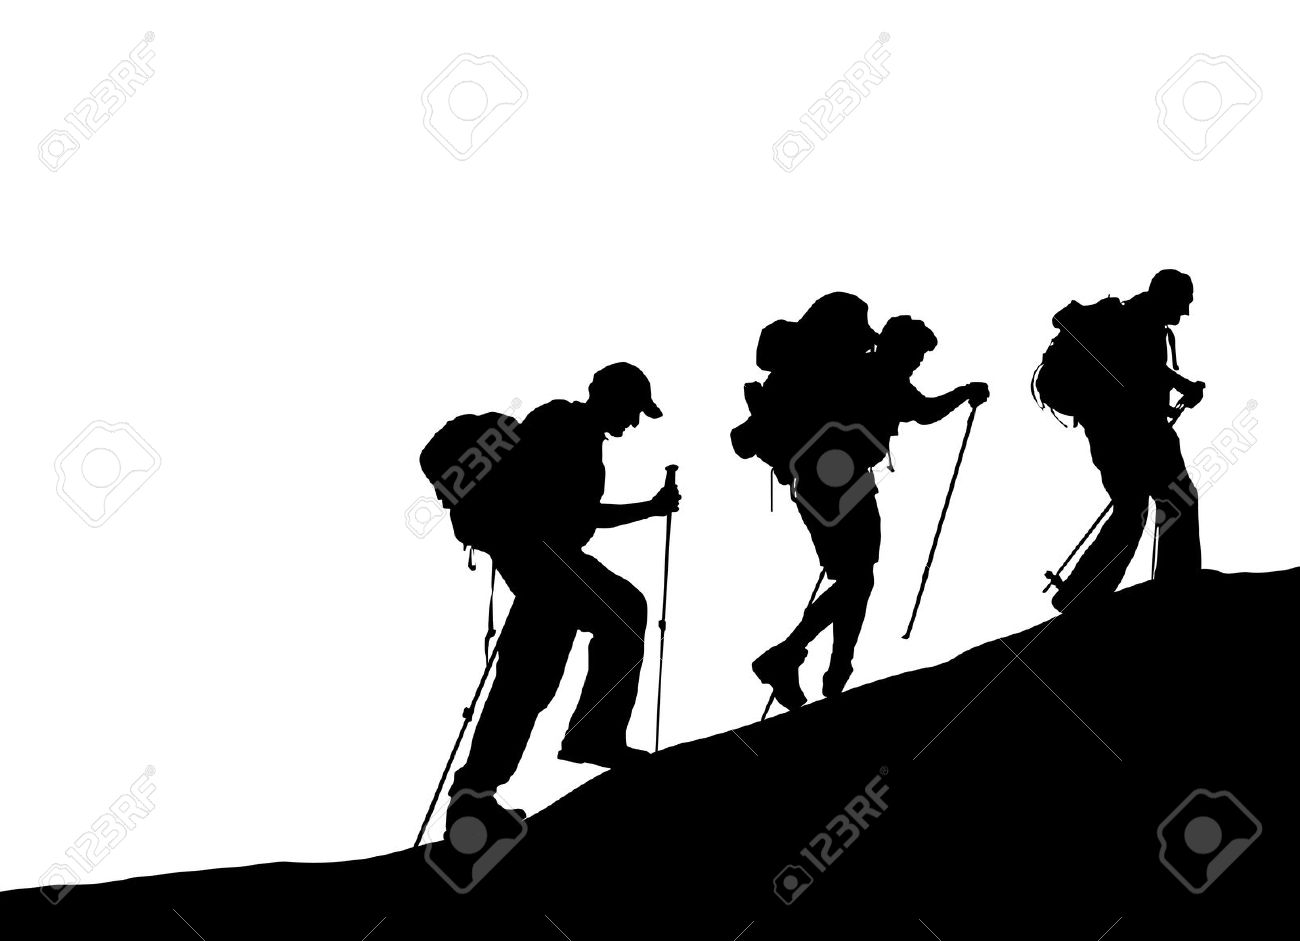 1300x941 Climbing clipart mountain silhouette